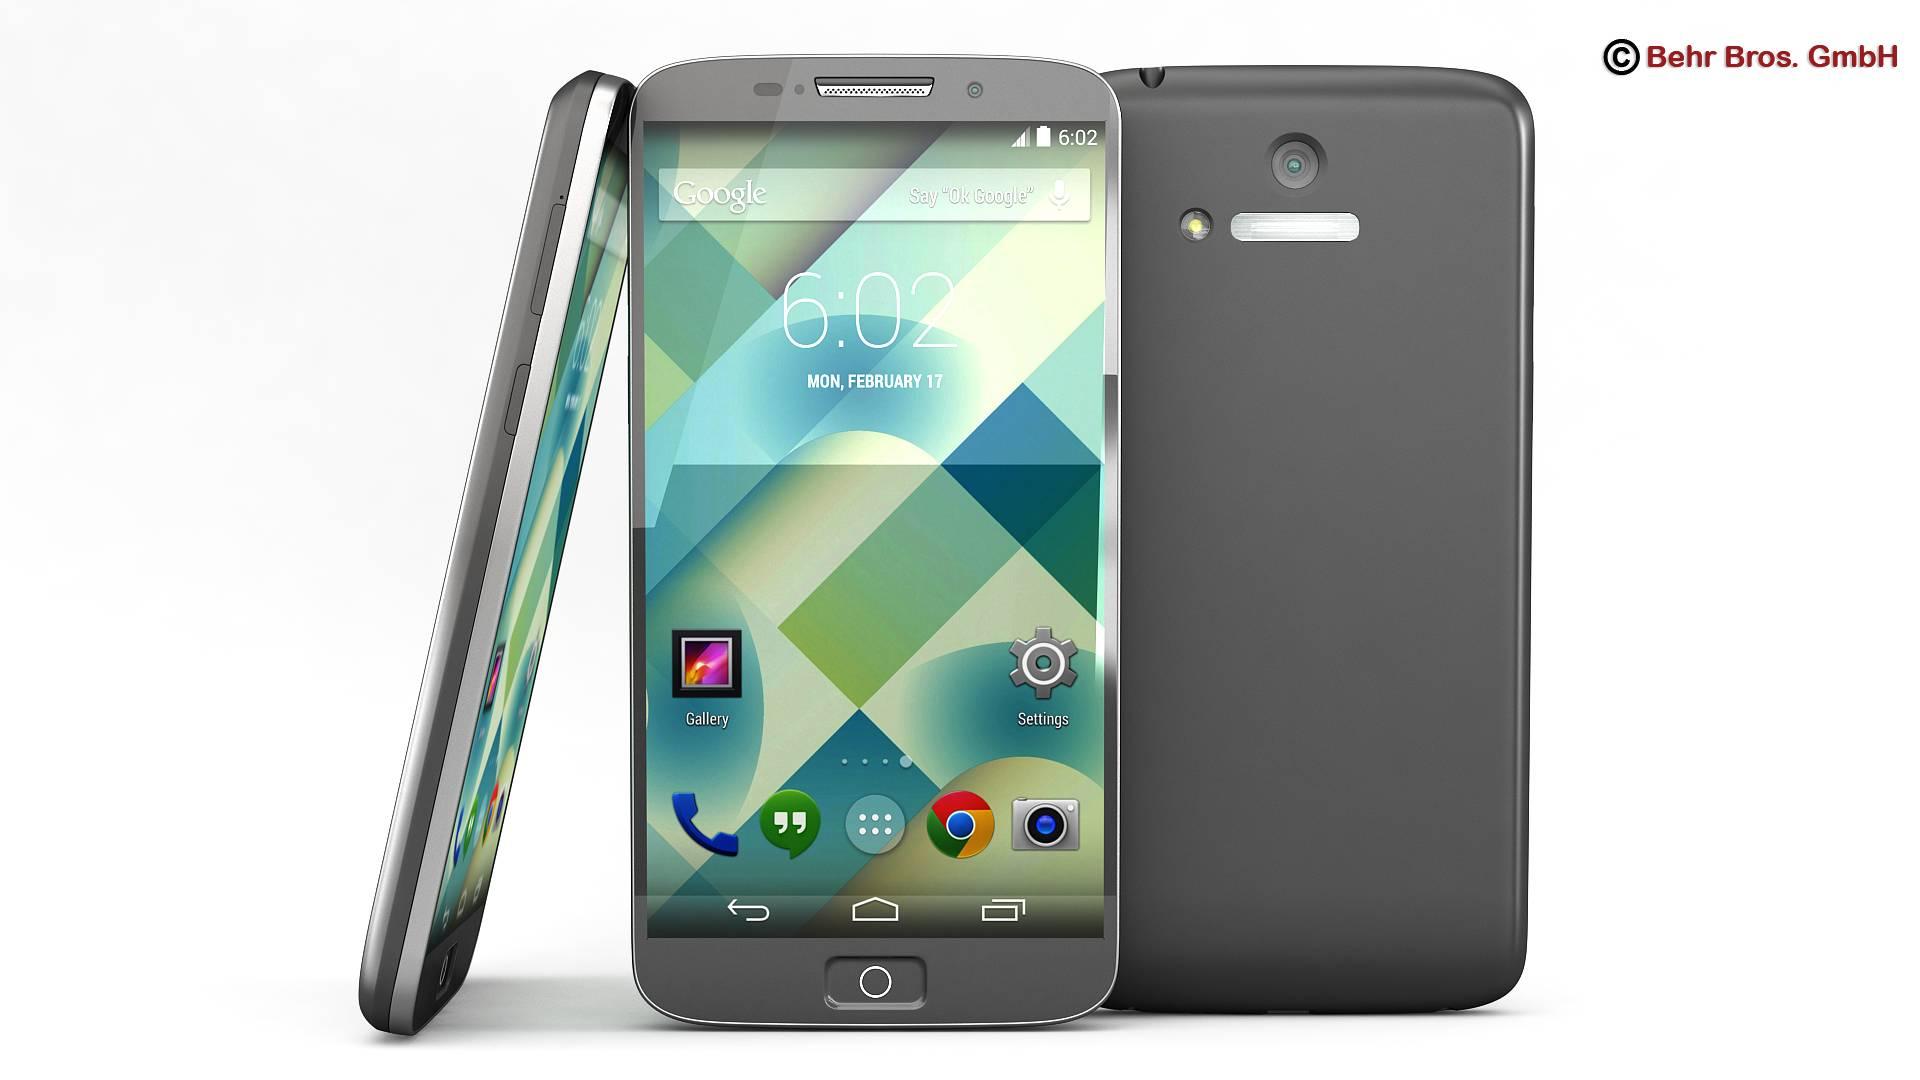 generic smartphone 5.2 inch 3d model 3ds max fbx c4d lwo ma mb obj 161646